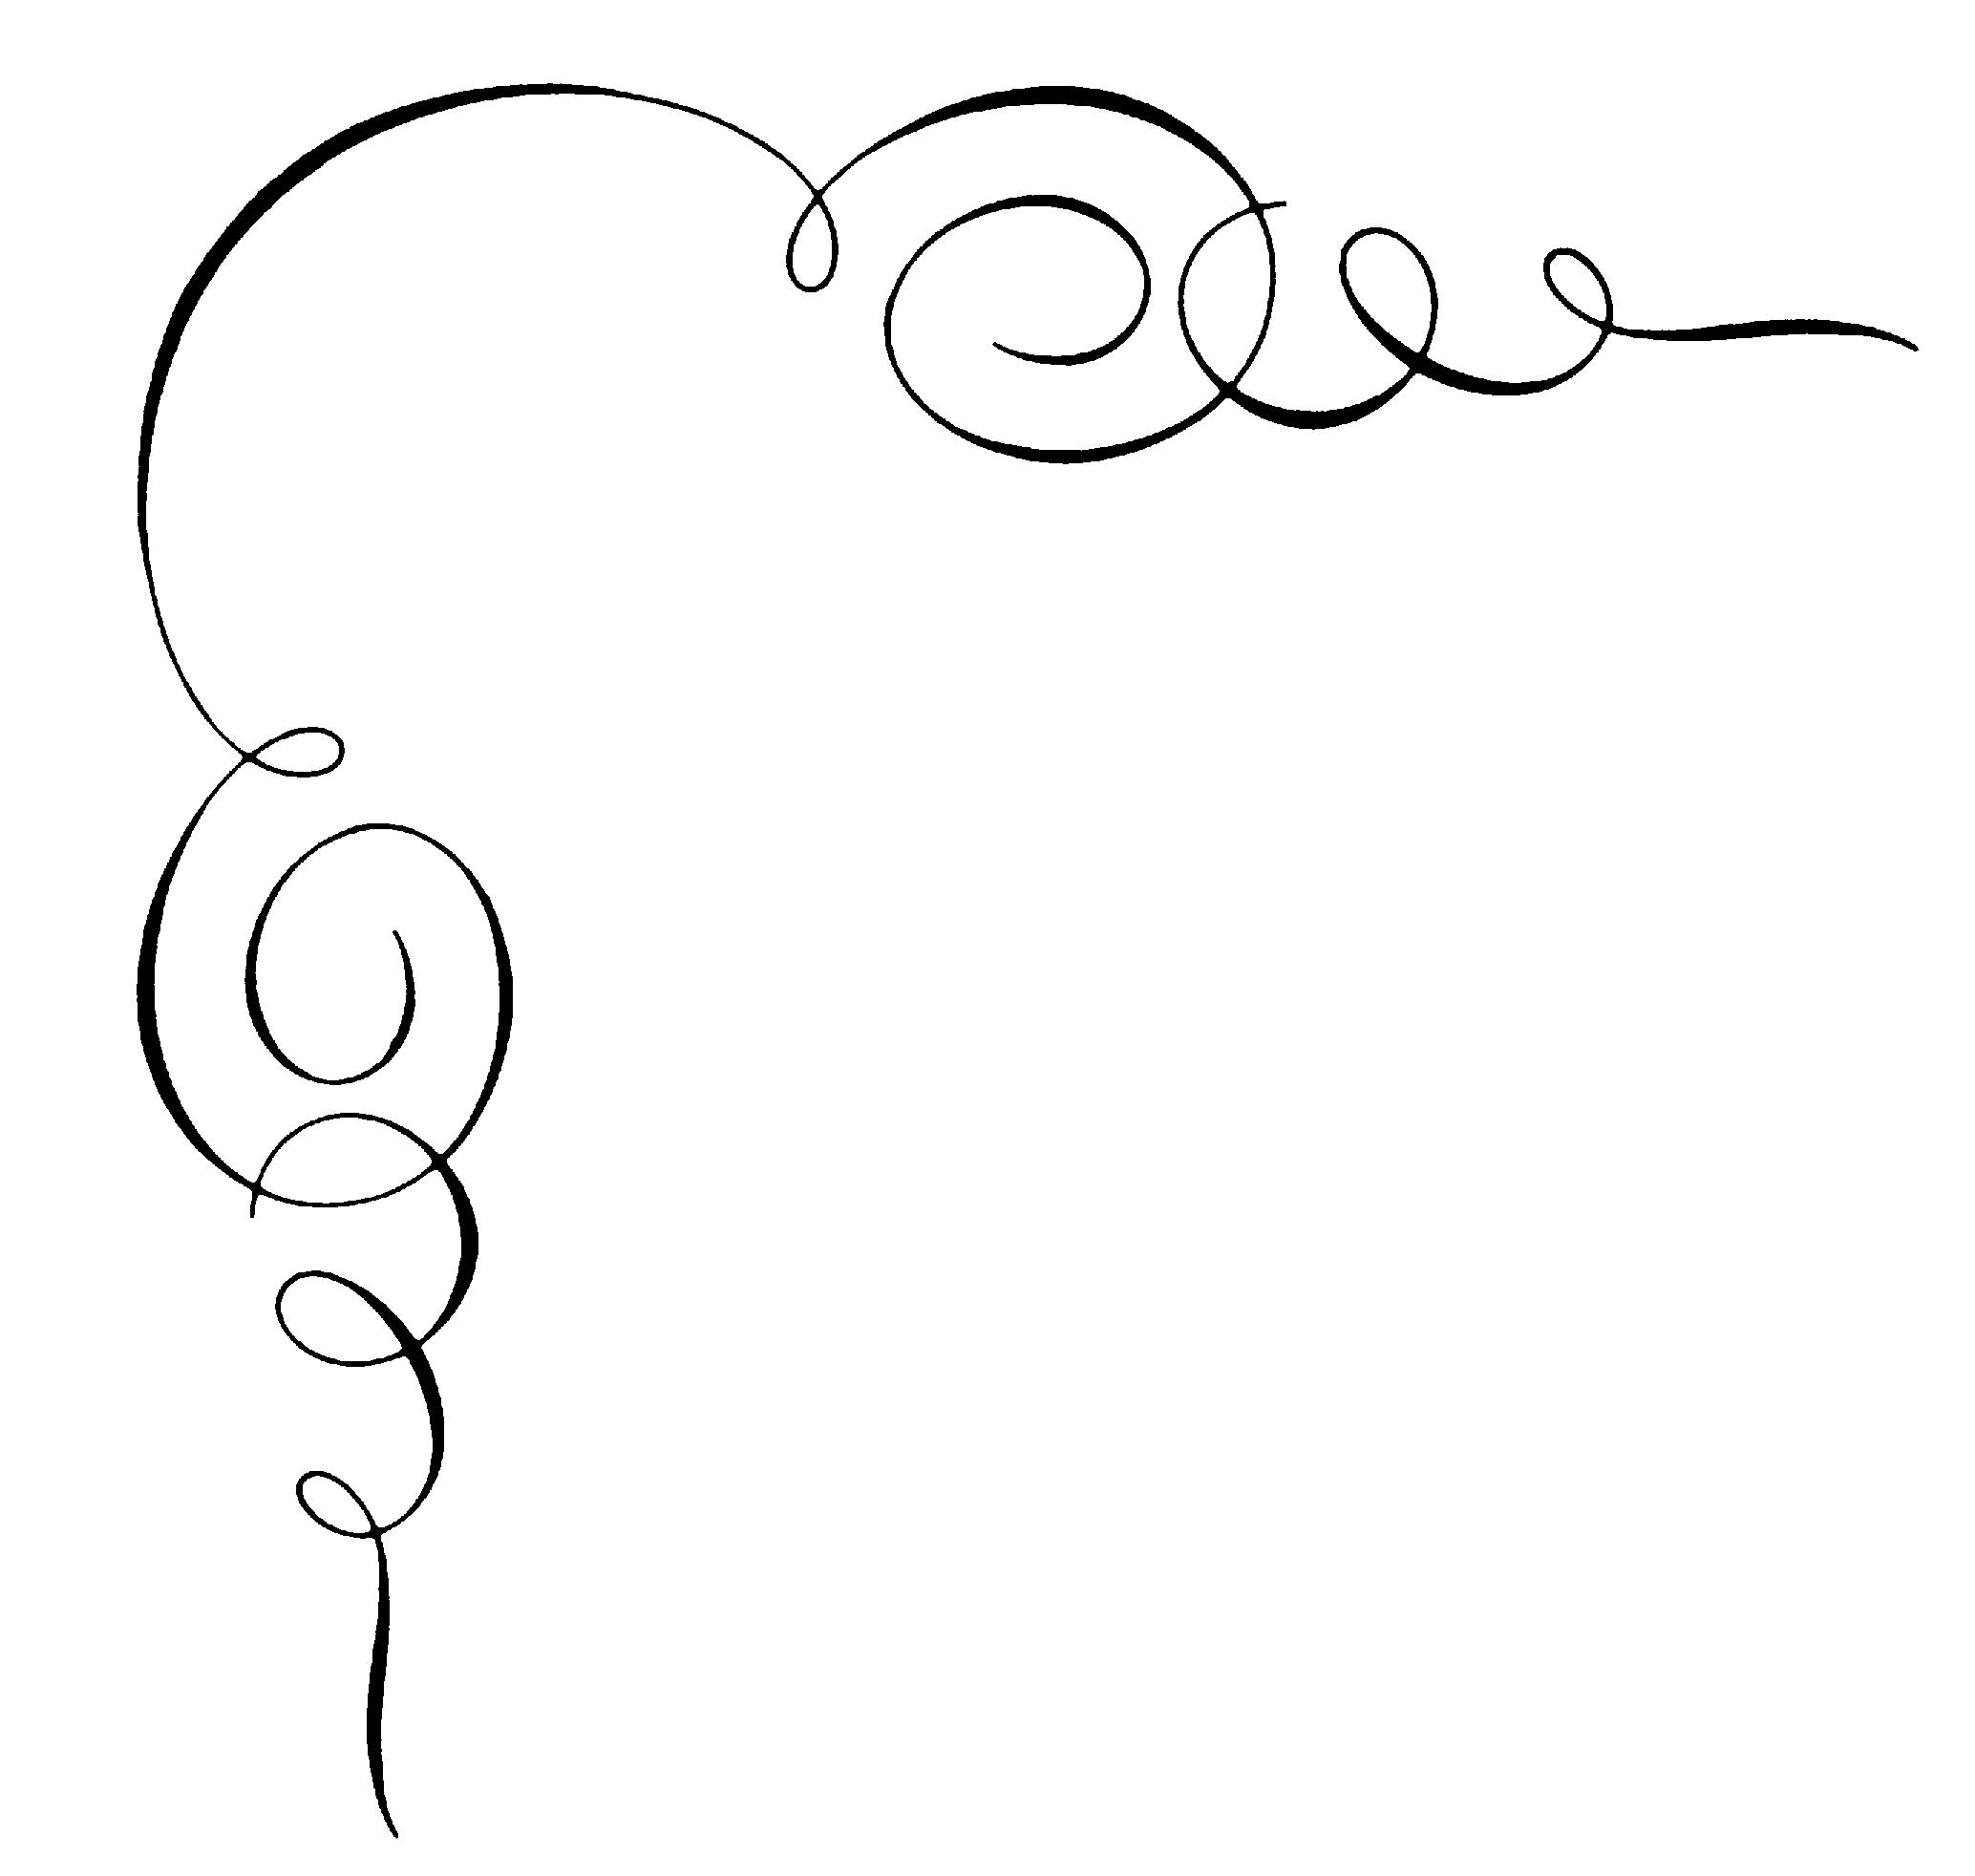 Free Elegant Borders, Download Free Clip Art, Free Clip Art.